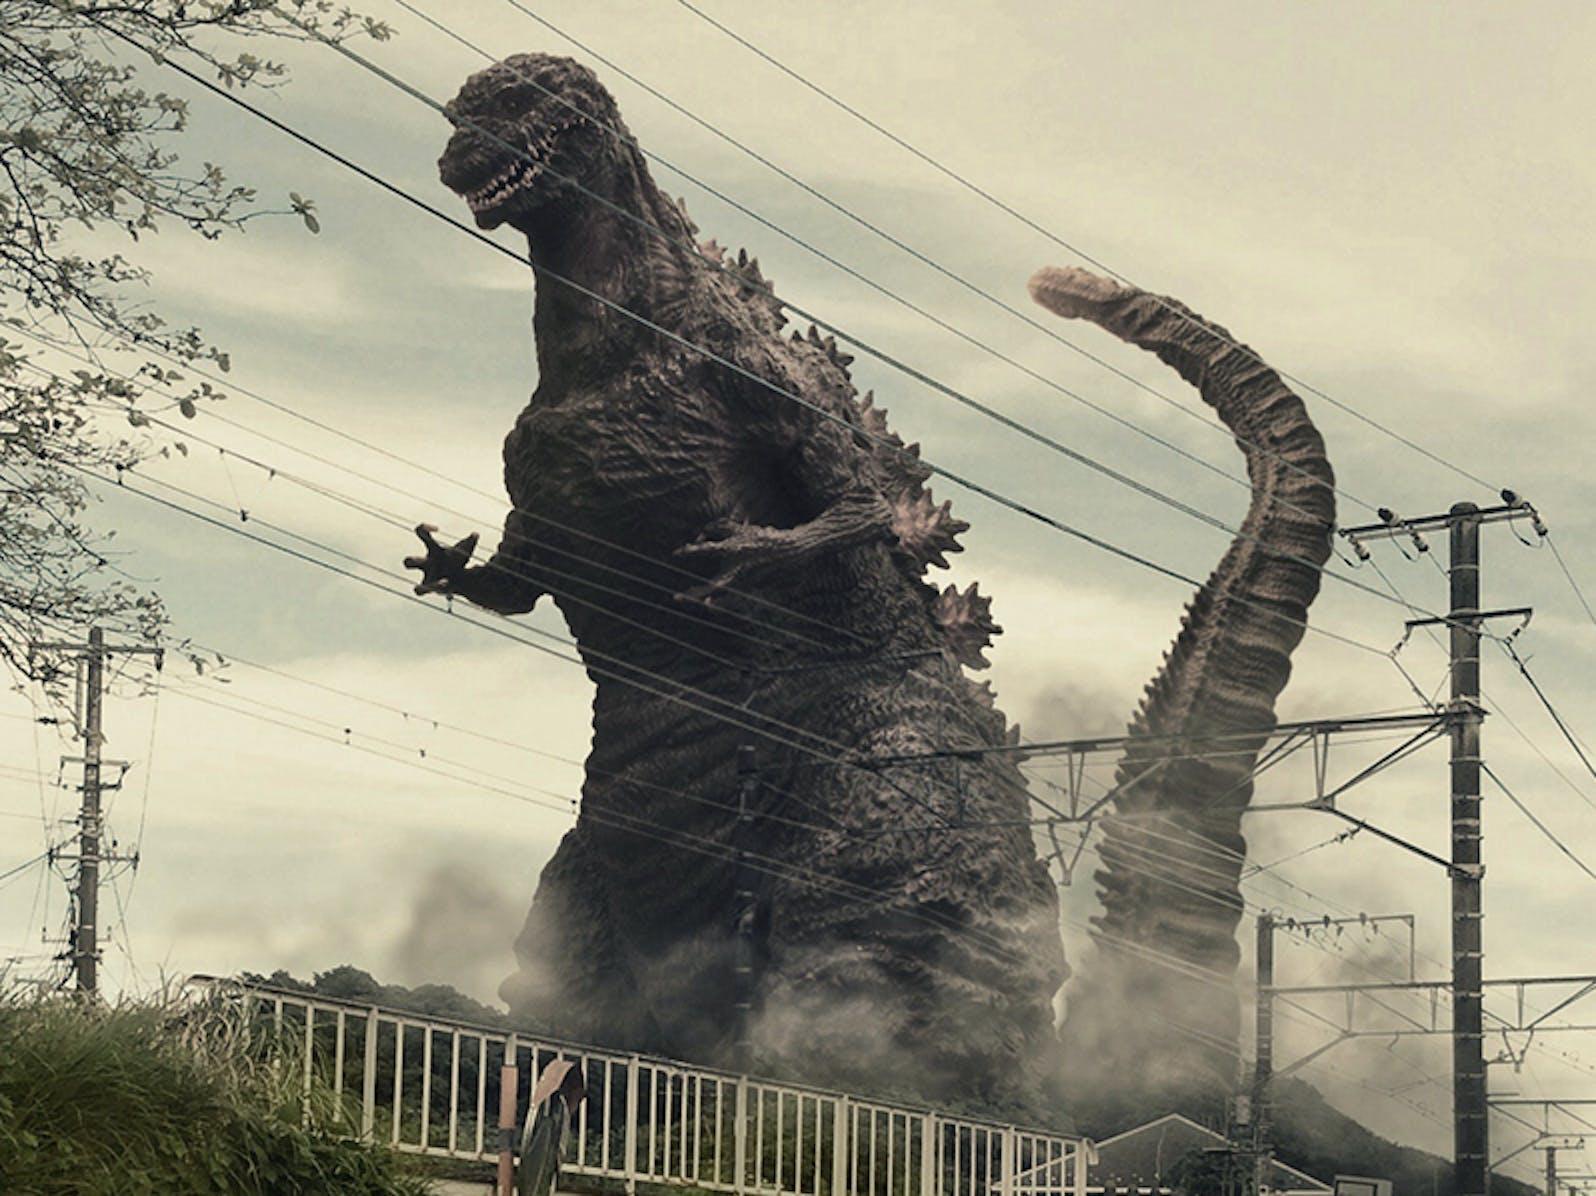 Shin Godzilla's Politics and the Meaning Behind Godzilla Films | Inverse